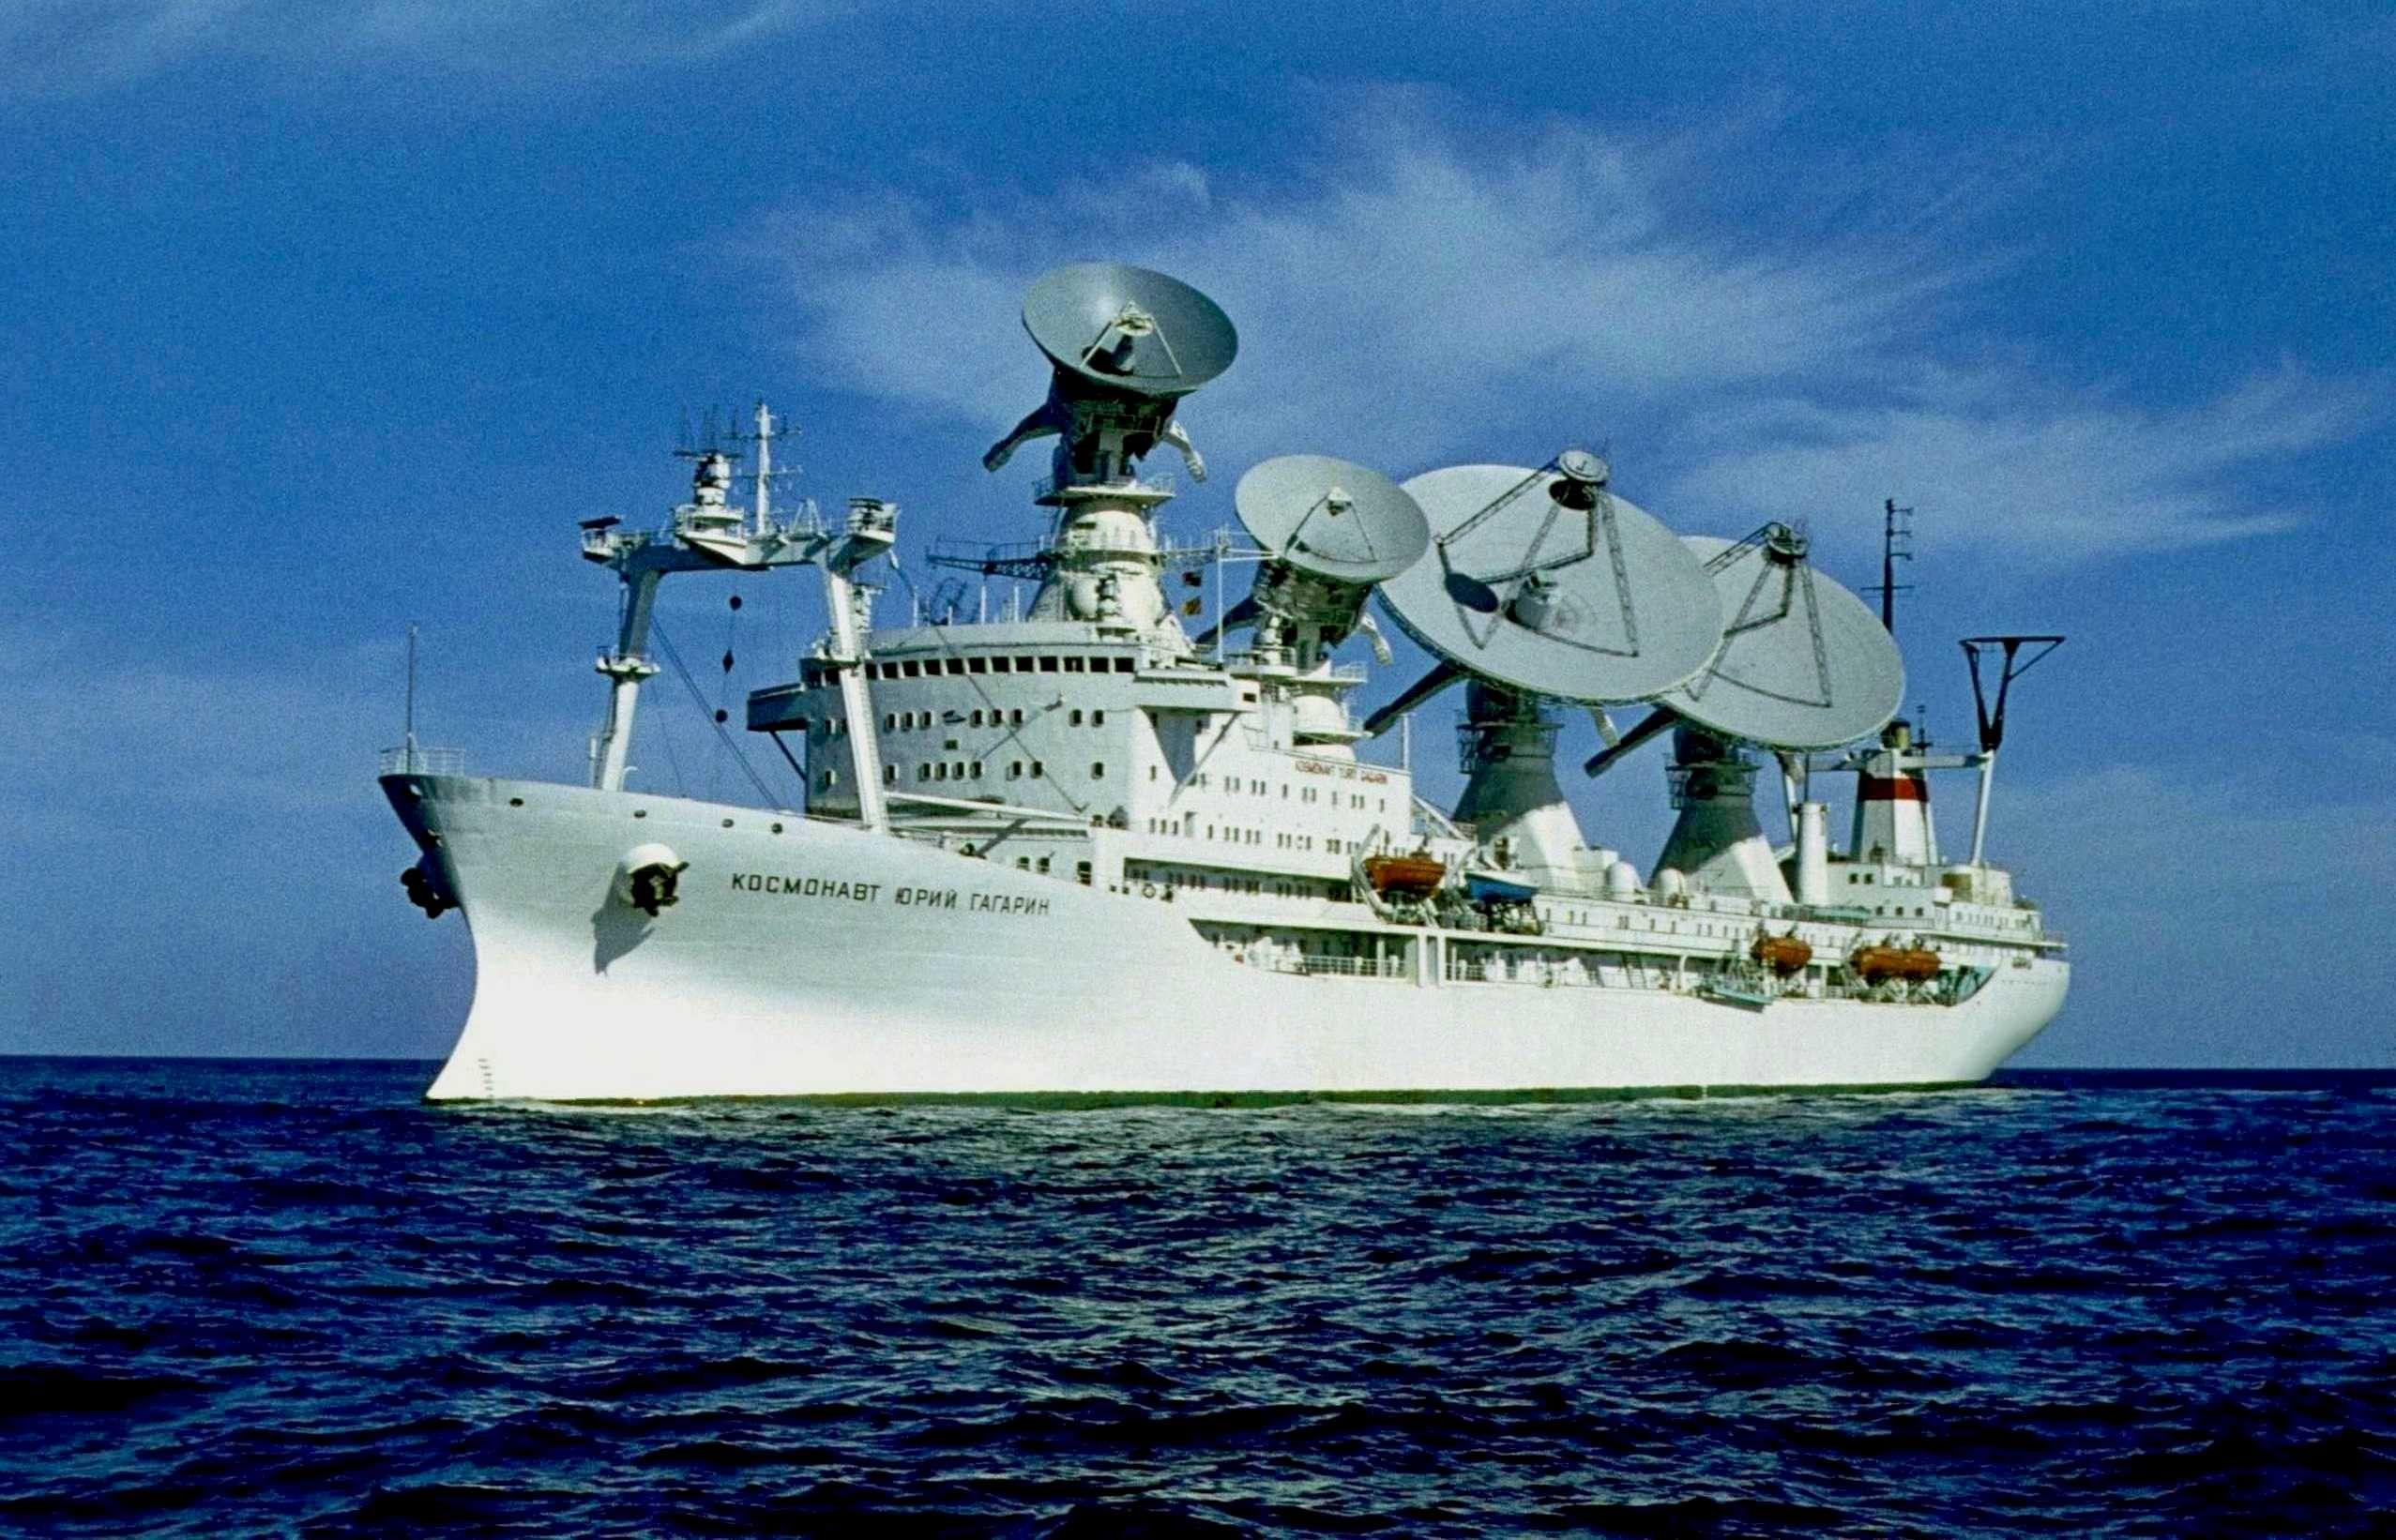 Flota Naval Espacial de la Unión Soviética